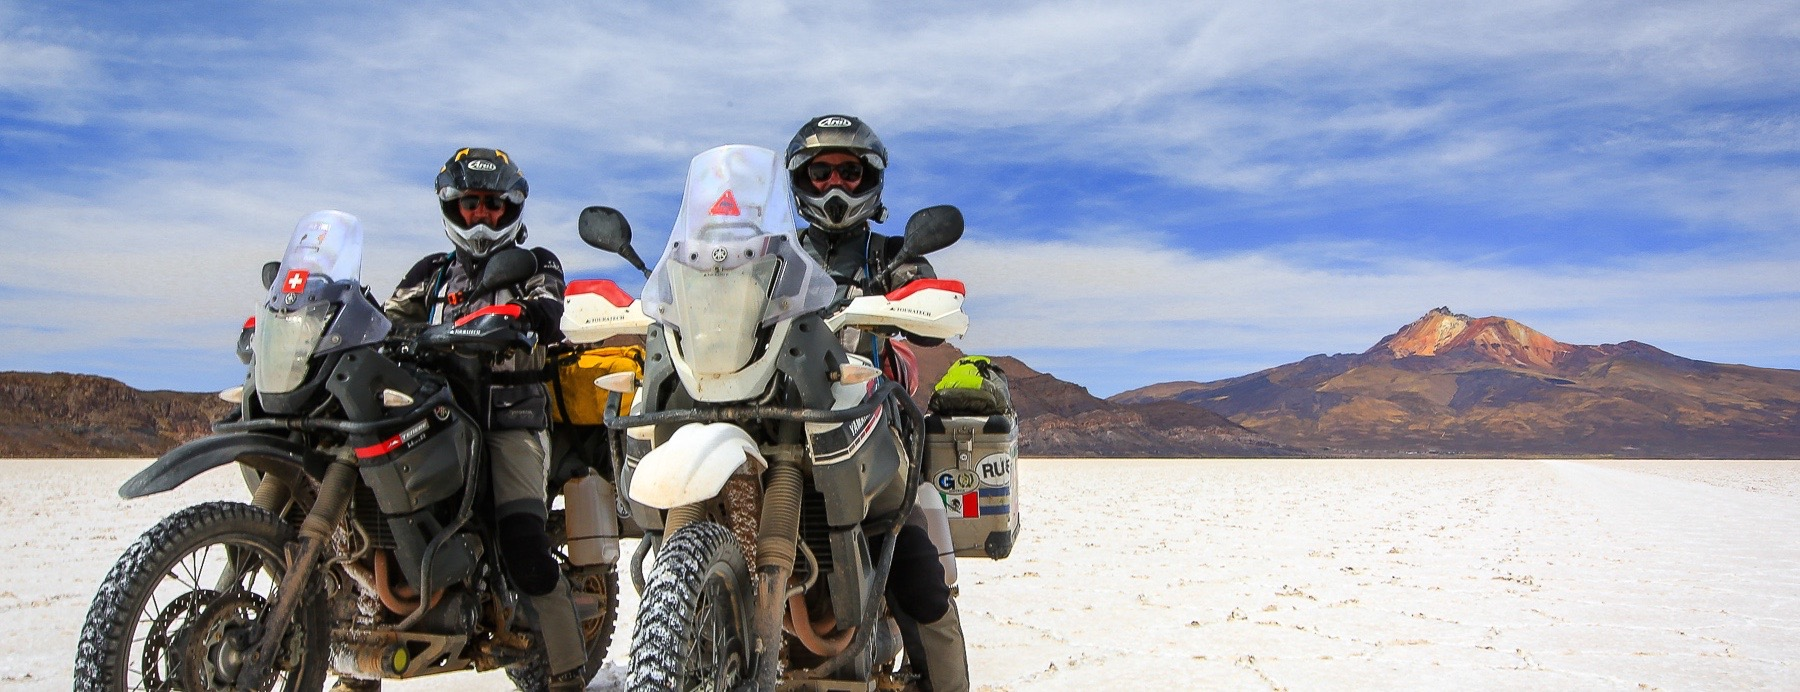 Auf dem Salar de Uyuni mit dem Motorrad Yamaha Salzsee in Bolivien